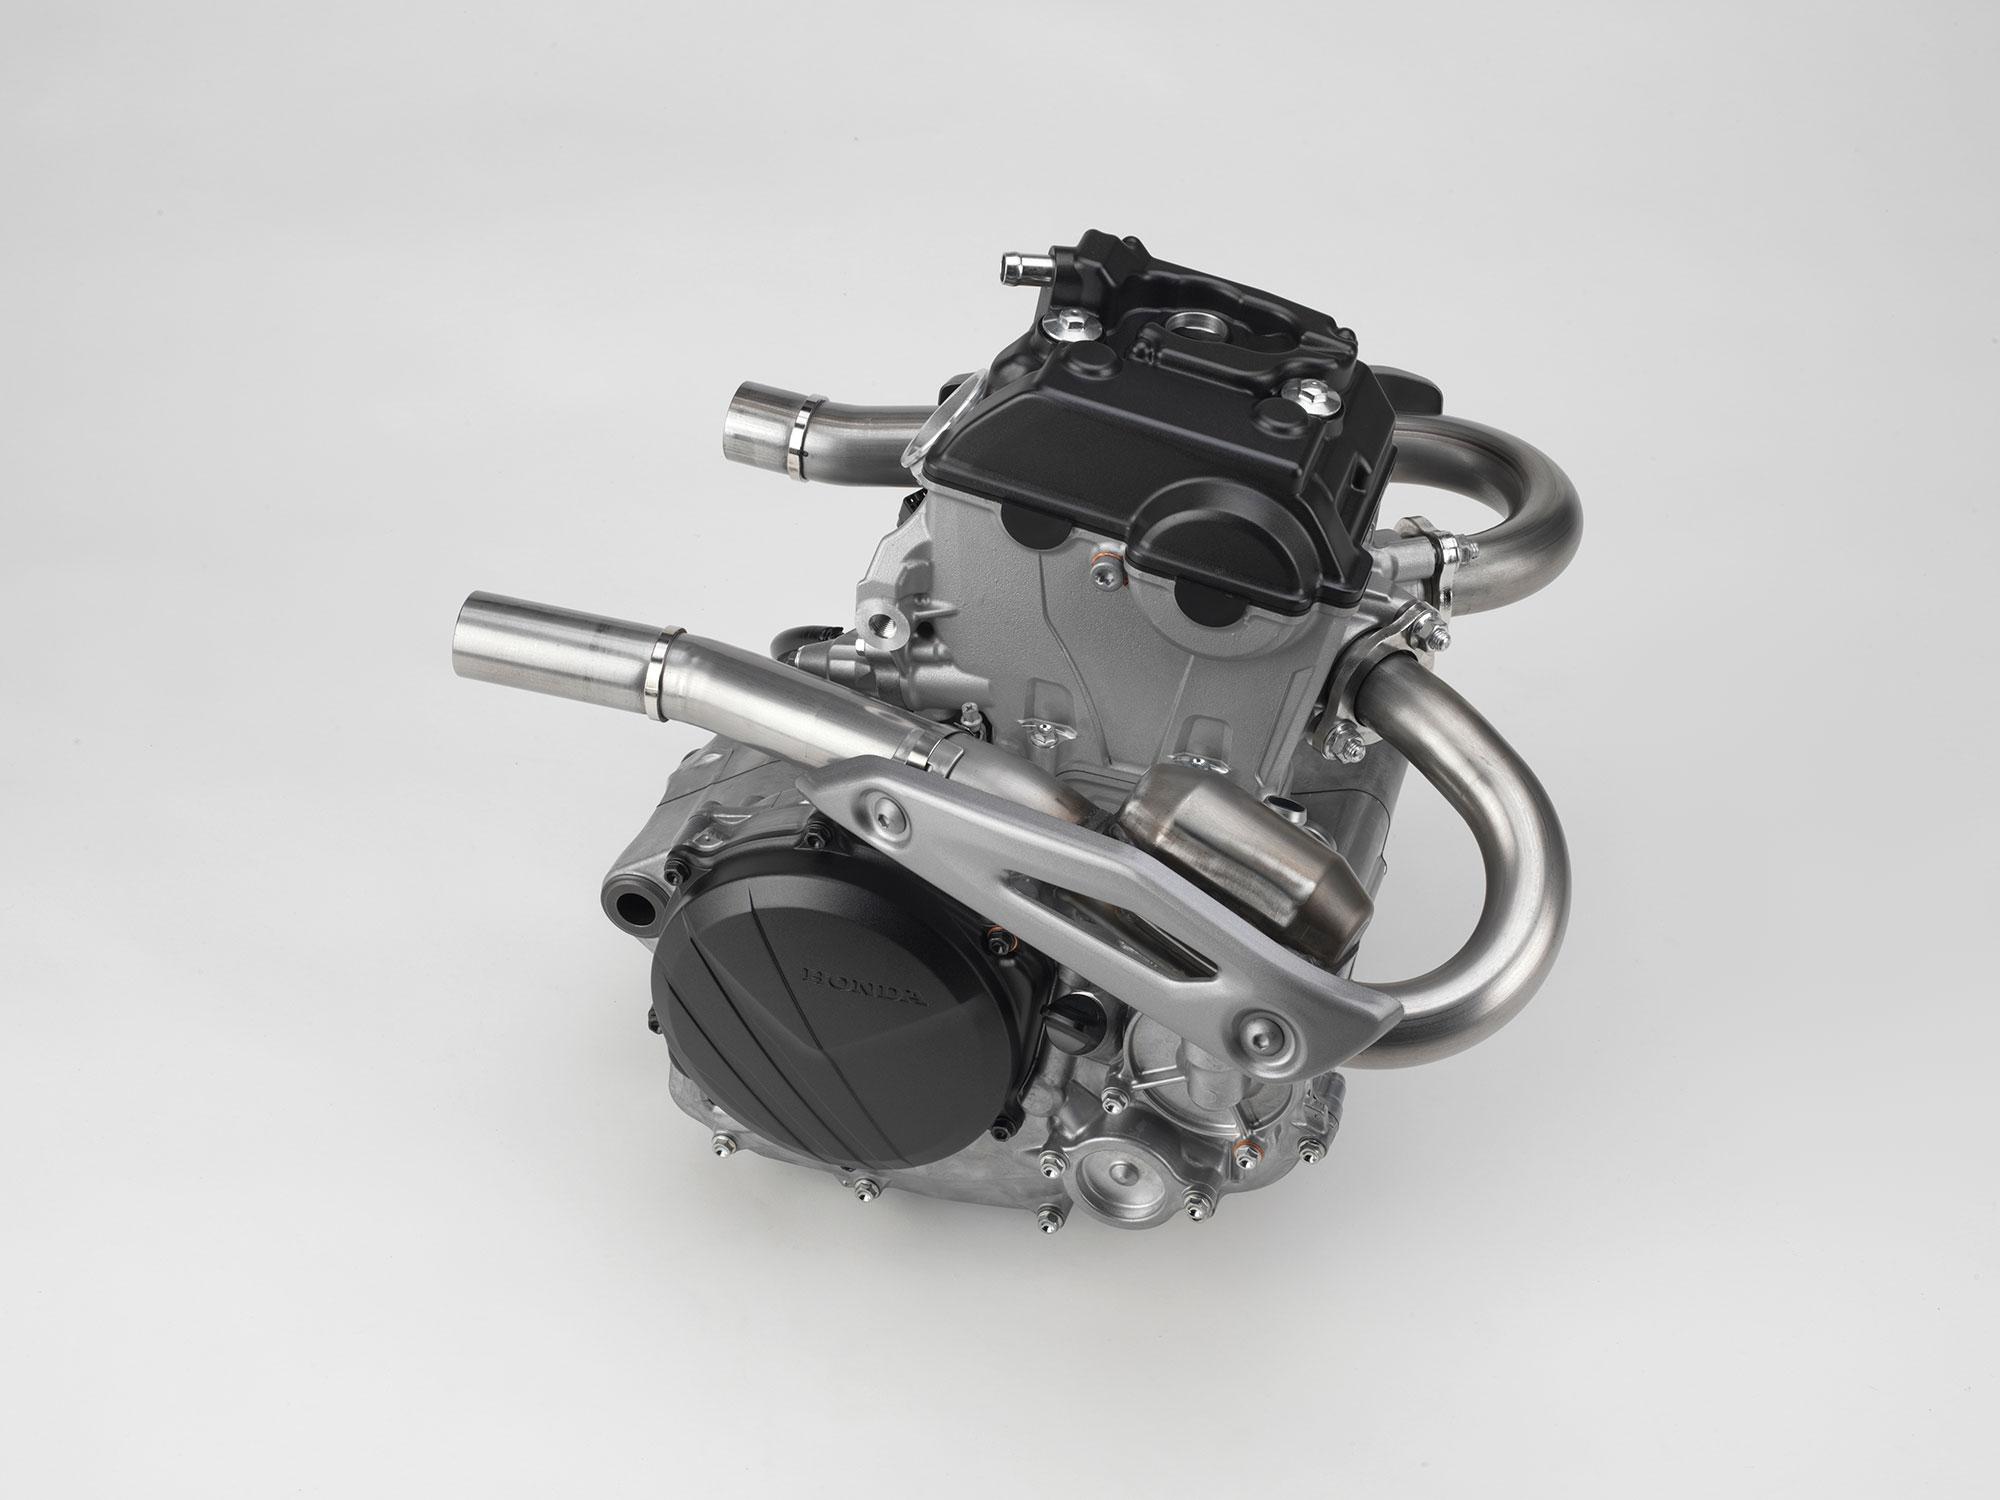 18_CRF250R_ENGINE_HEADERS_RT.jpg